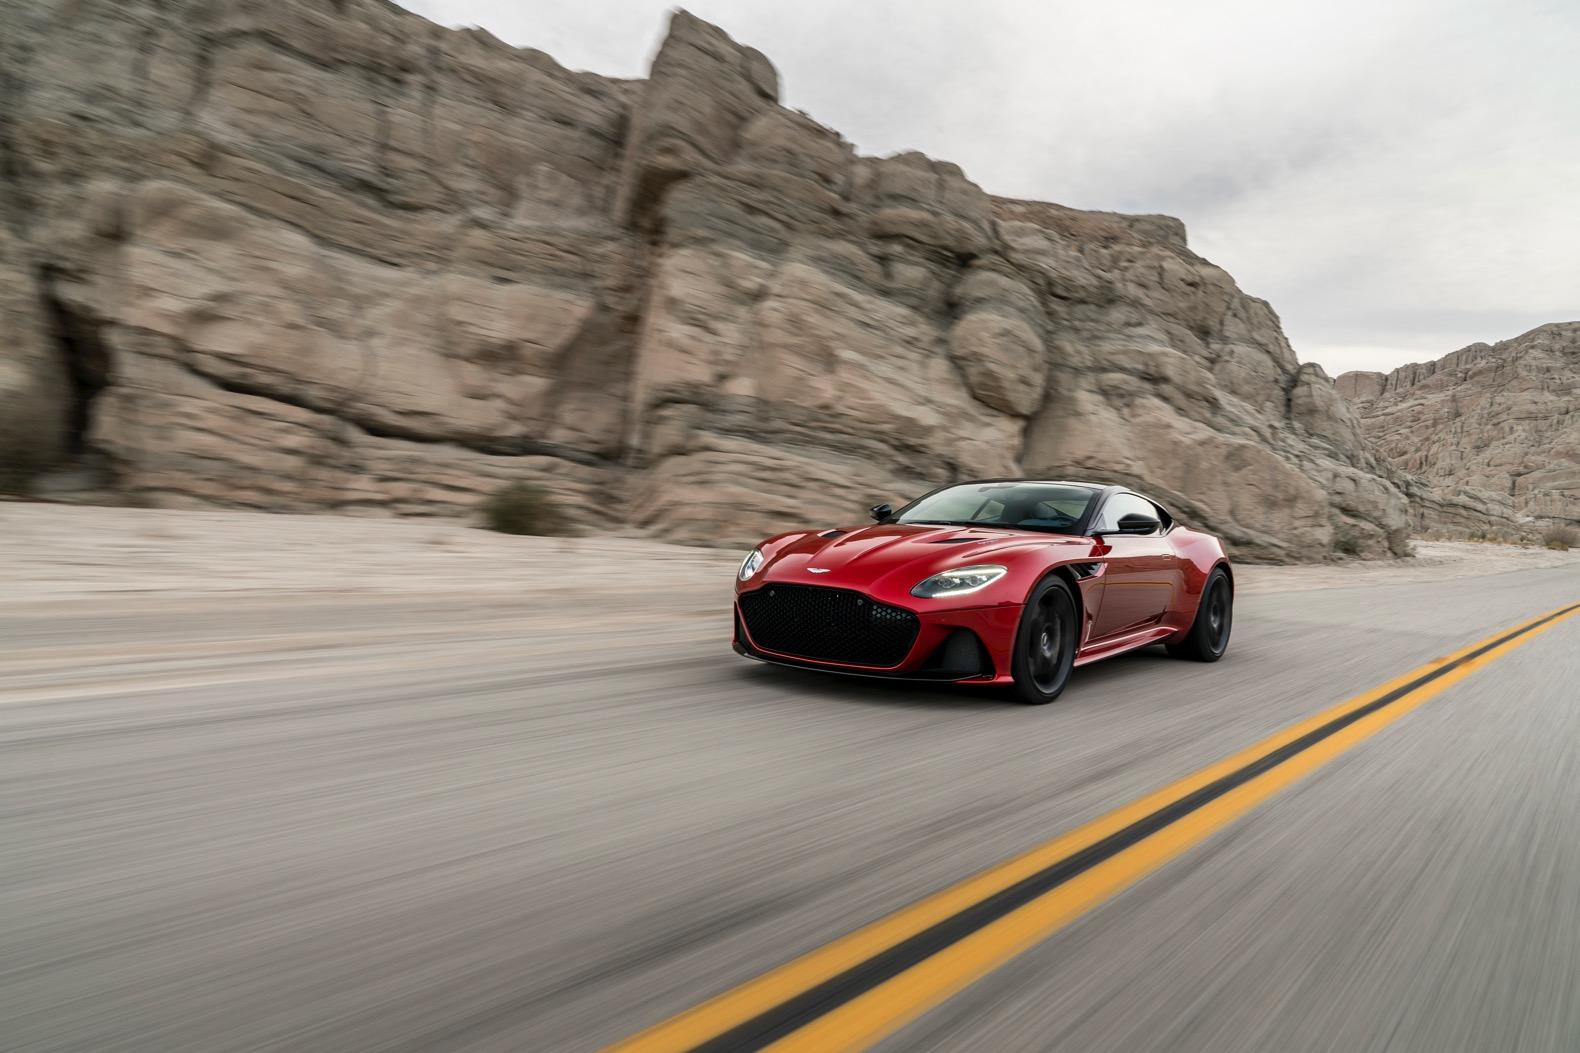 2019-Aston-Martin-DBS-Superleggera-0006.jpg